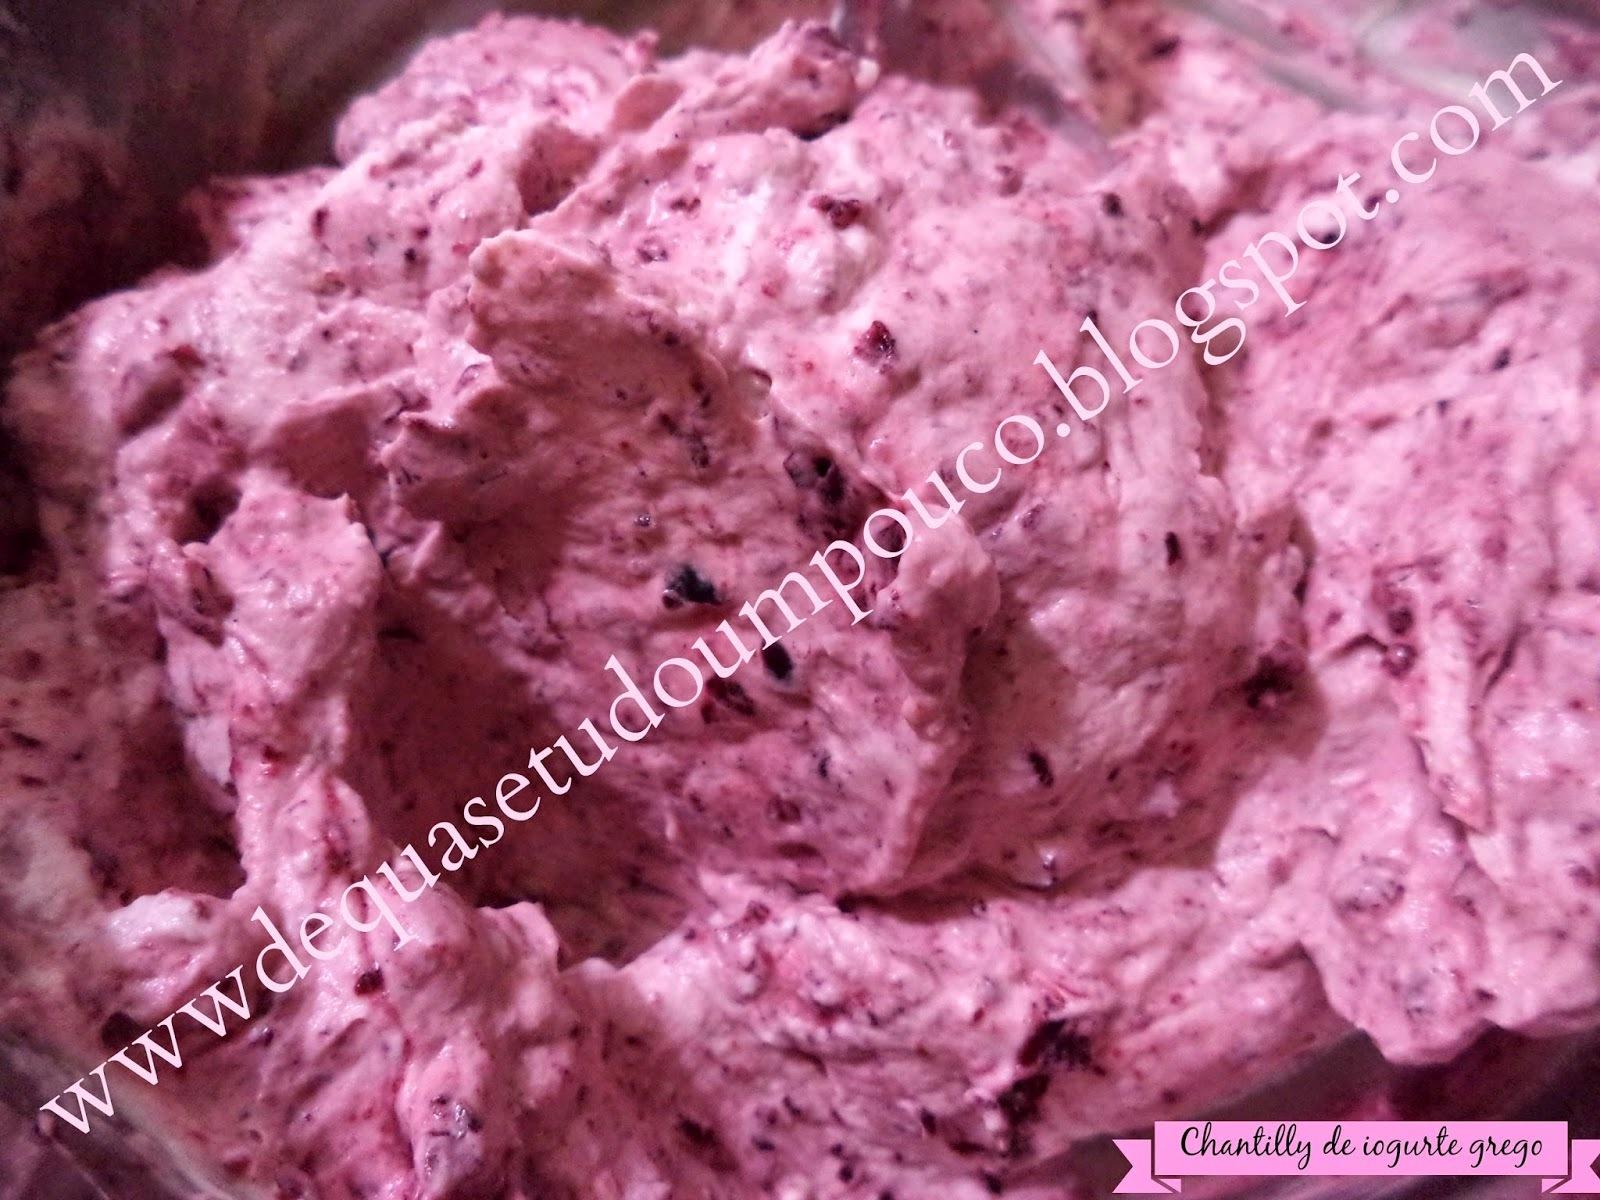 Chantilly de iogurte grego para recheio e cobertura de bolo